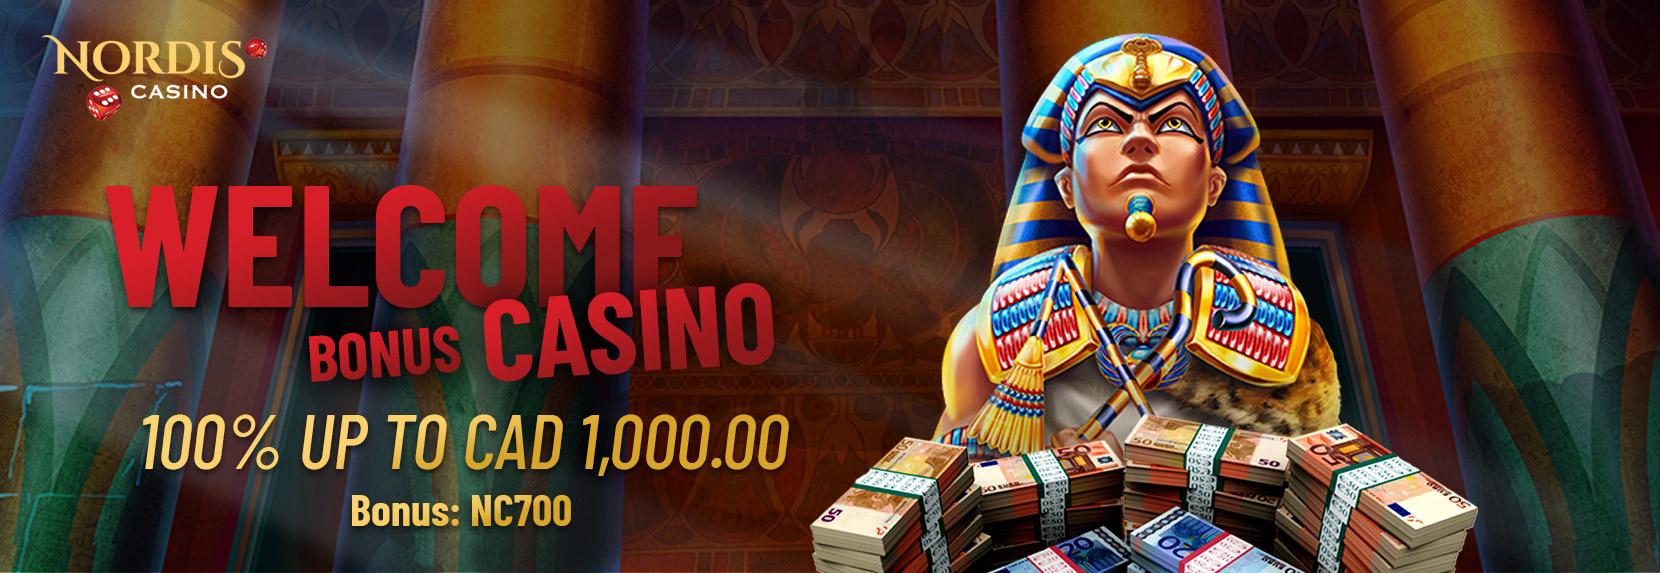 Welcome Bonus  Casino – CAD